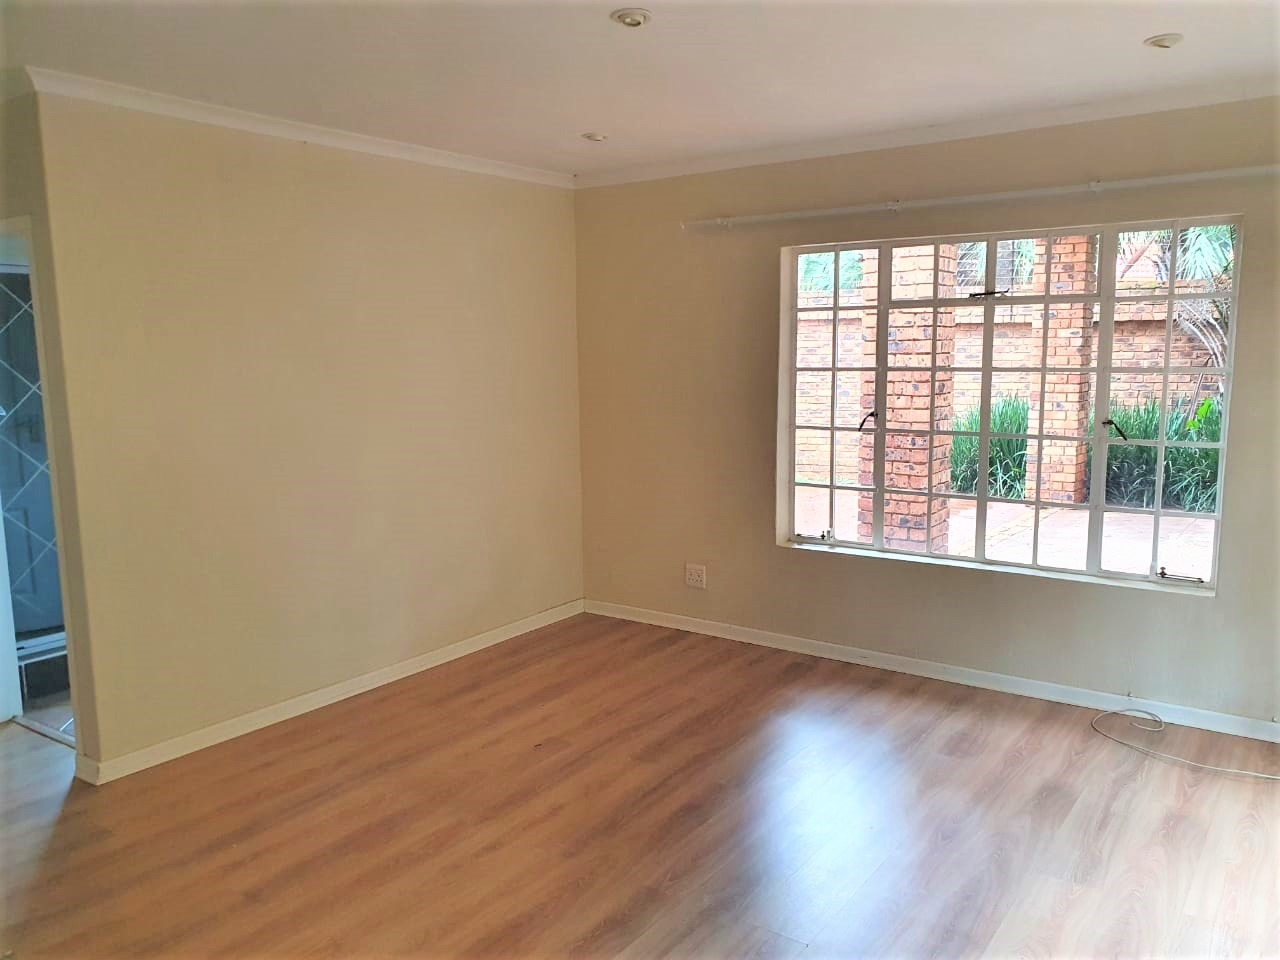 House For Sale in Zwavelpoort